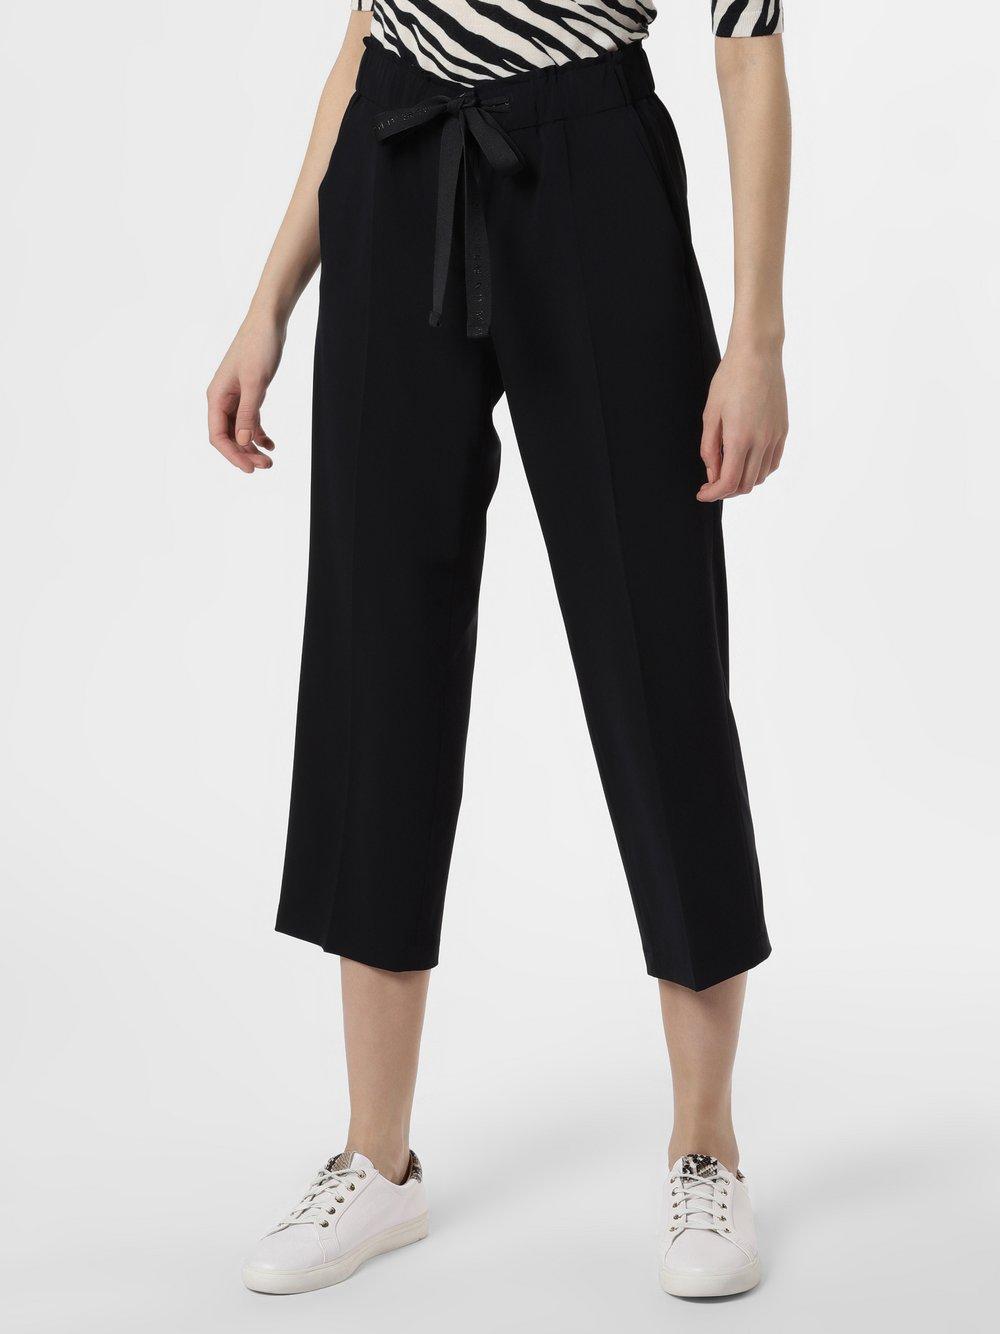 Cambio - Spodnie damskie – Colette, niebieski